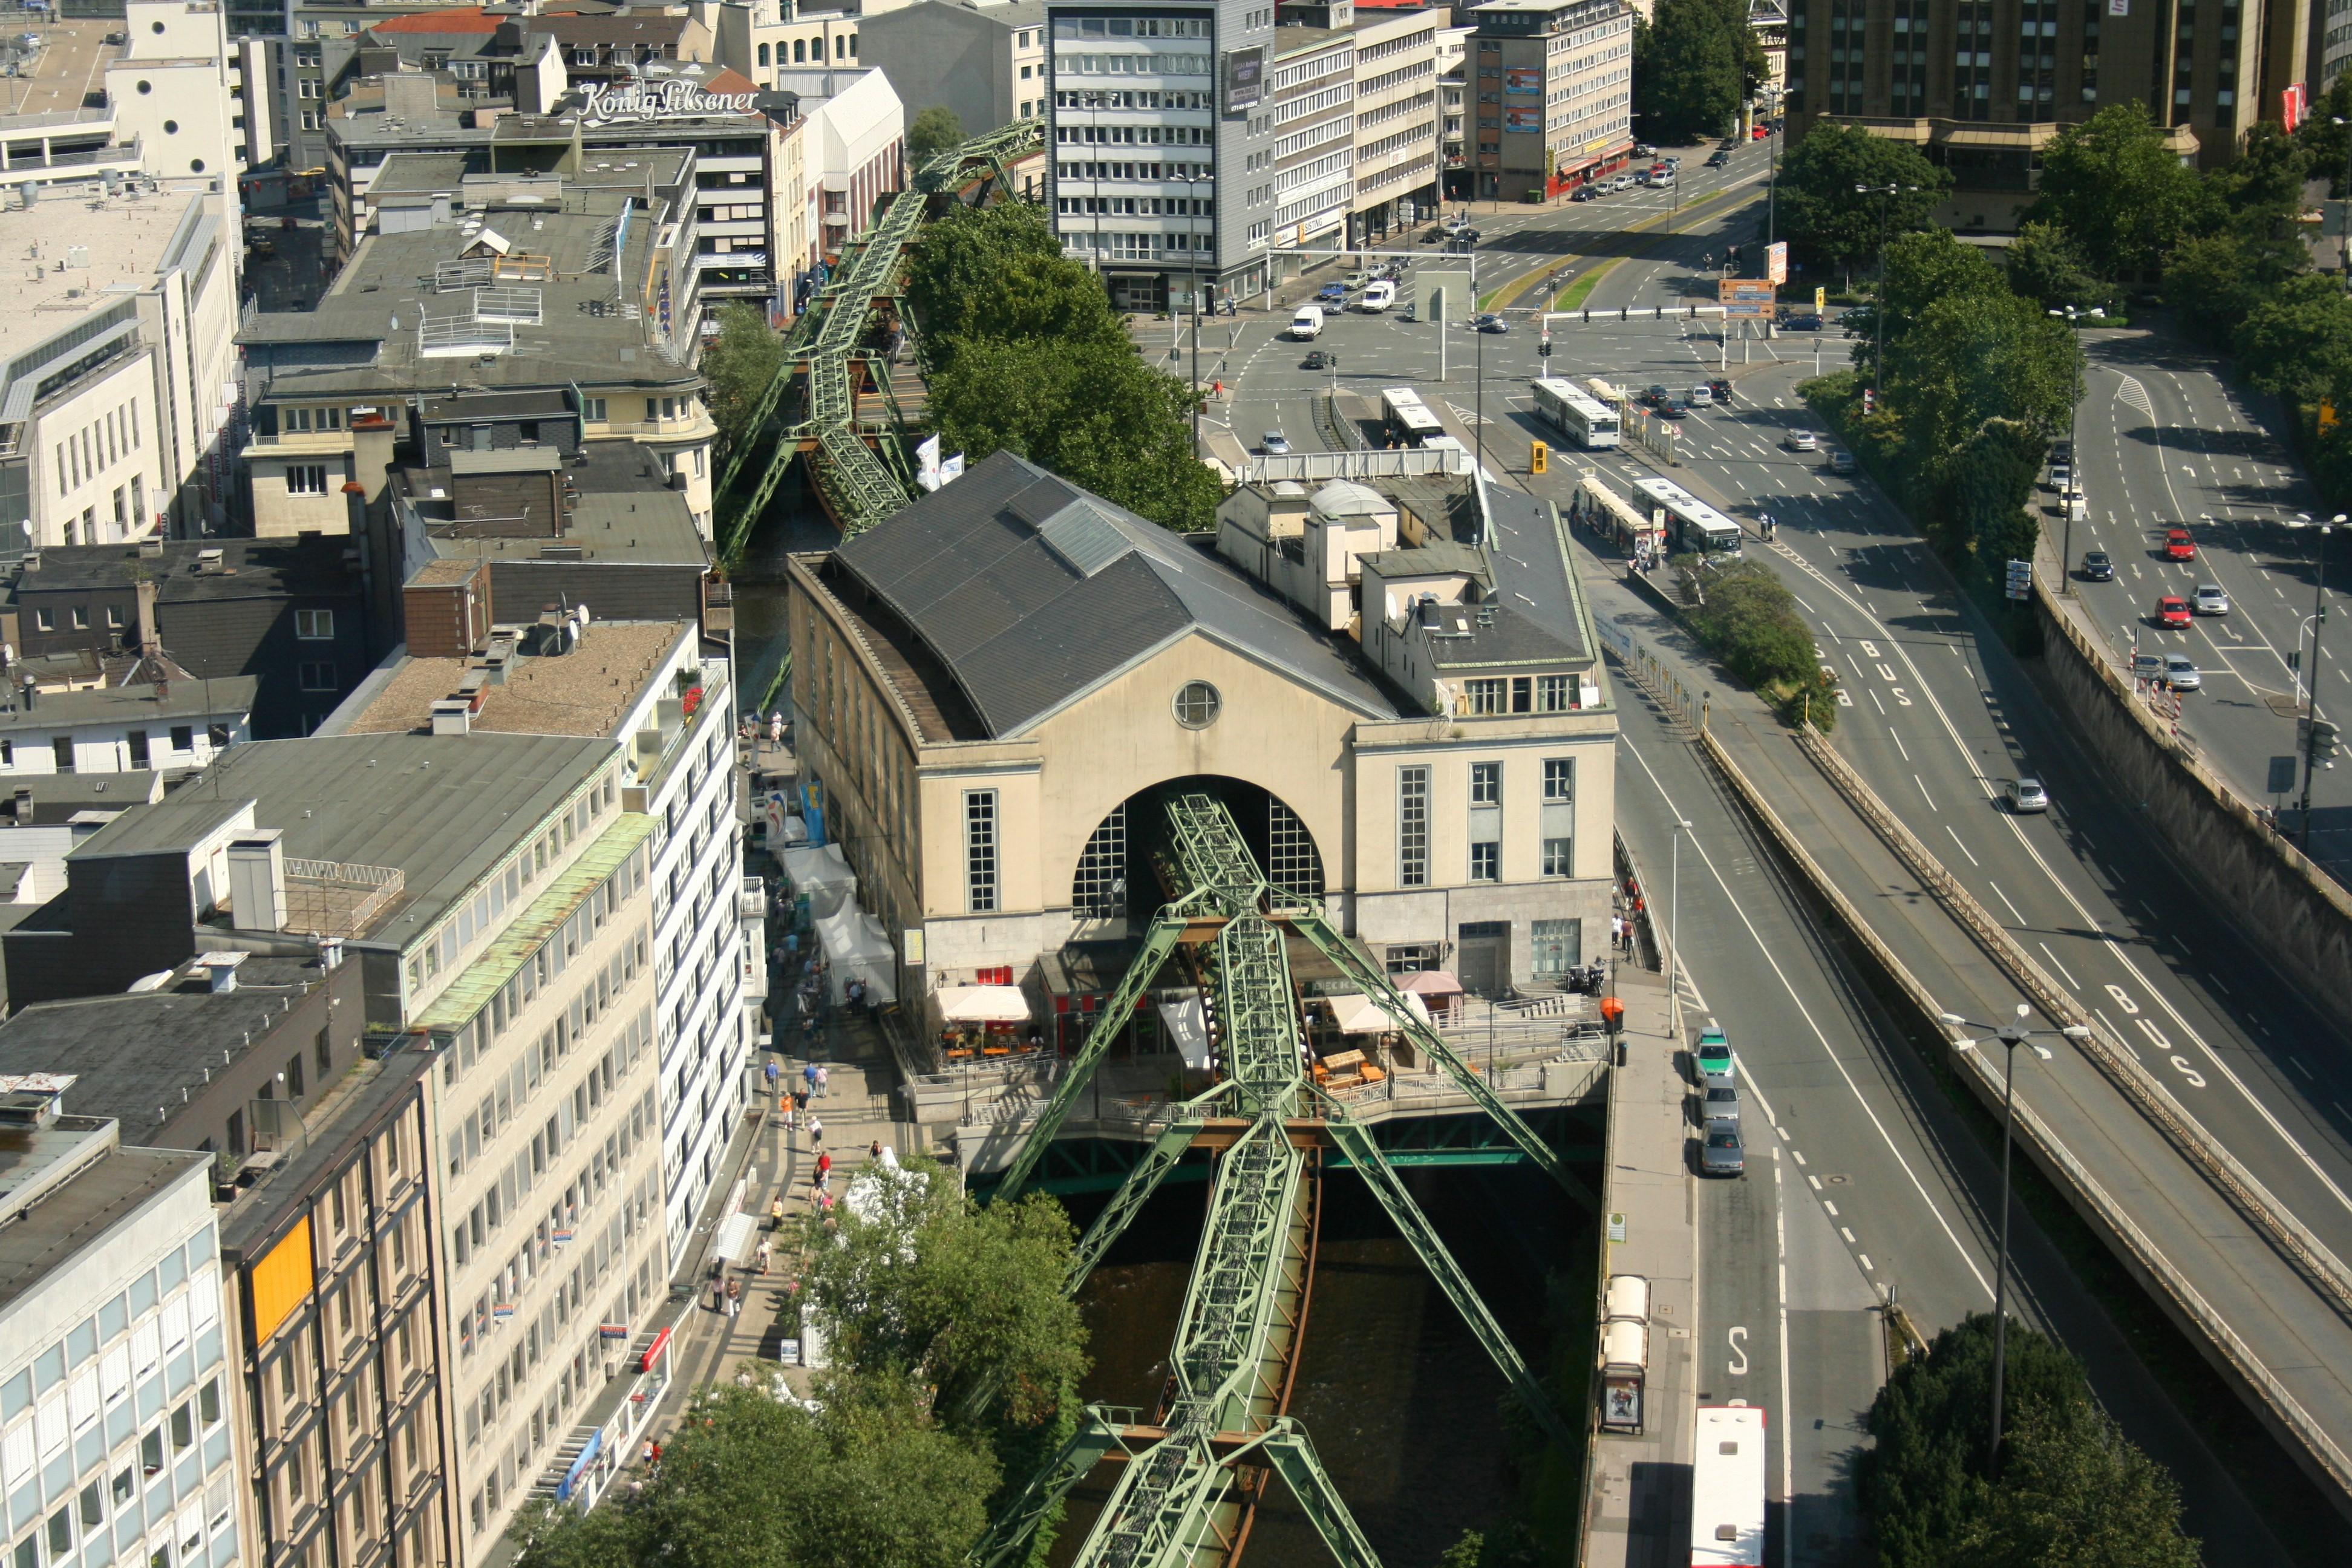 NRWTag W Sparkassenturm 03 ies.jpg